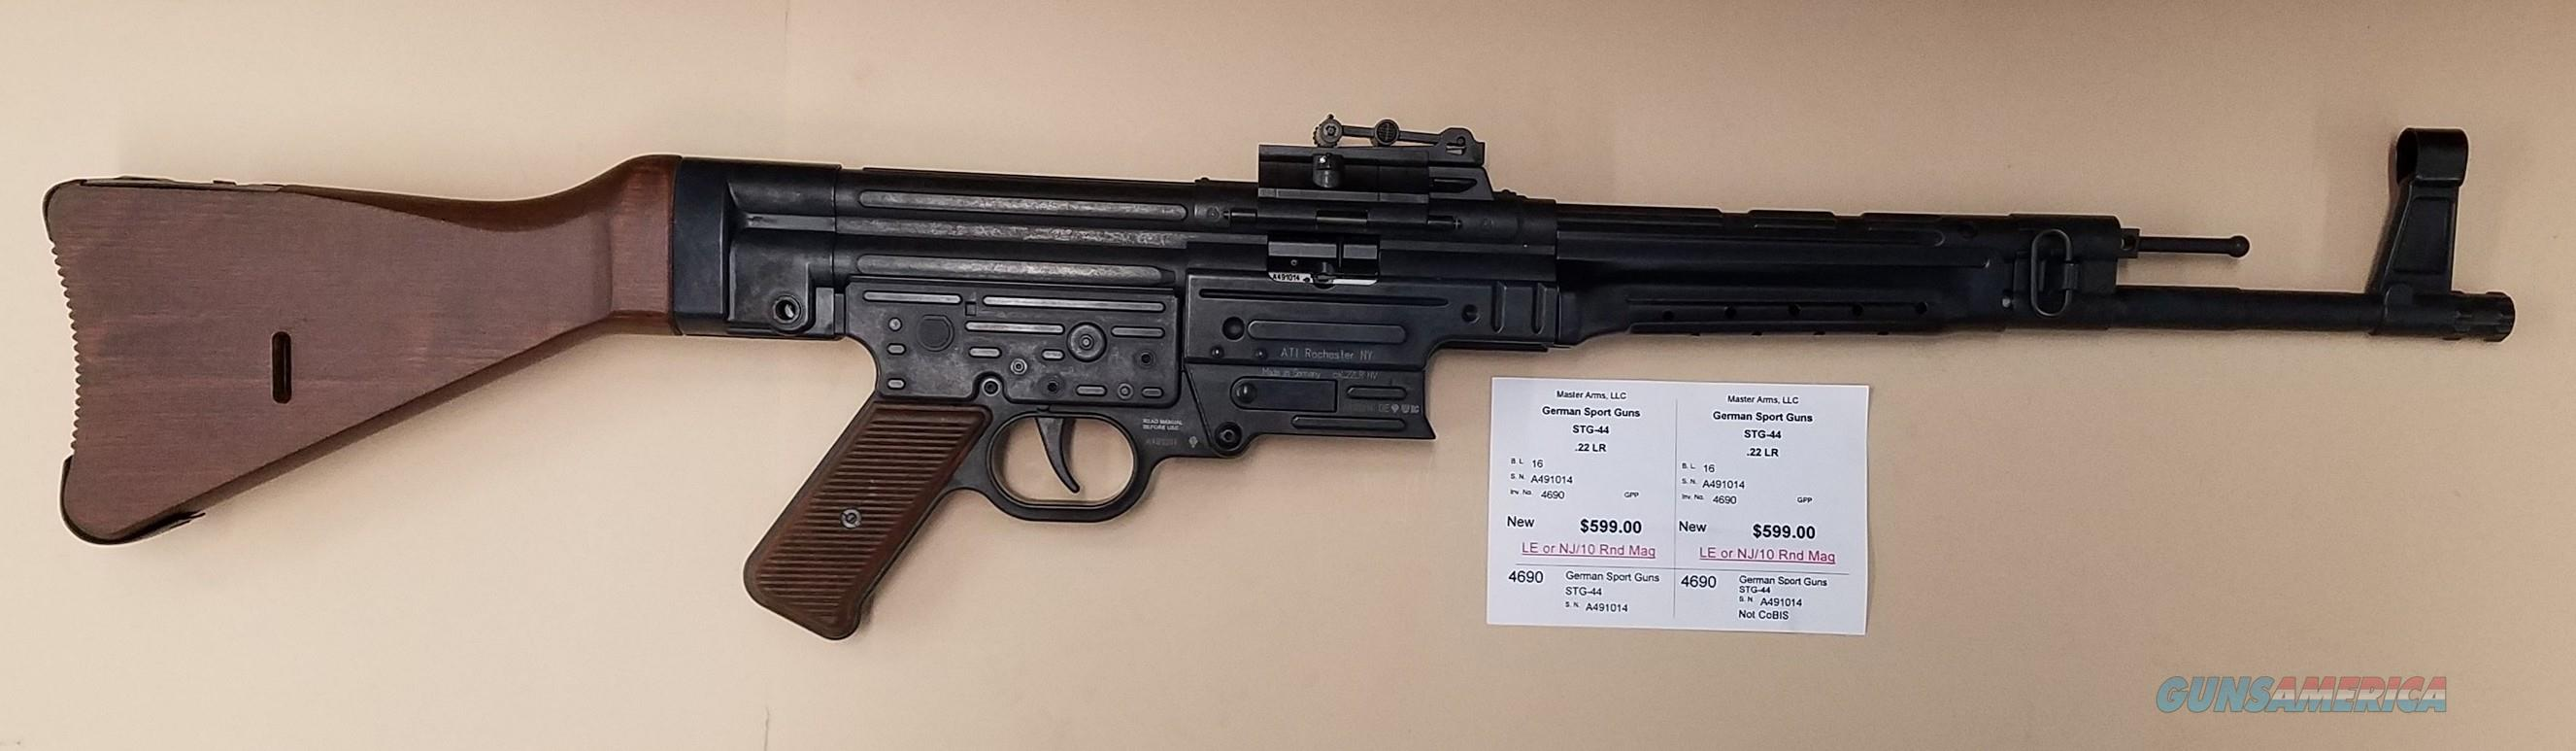 GERMAN SPORTS GUNS  Guns > Rifles > American Tactical Imports Rifles